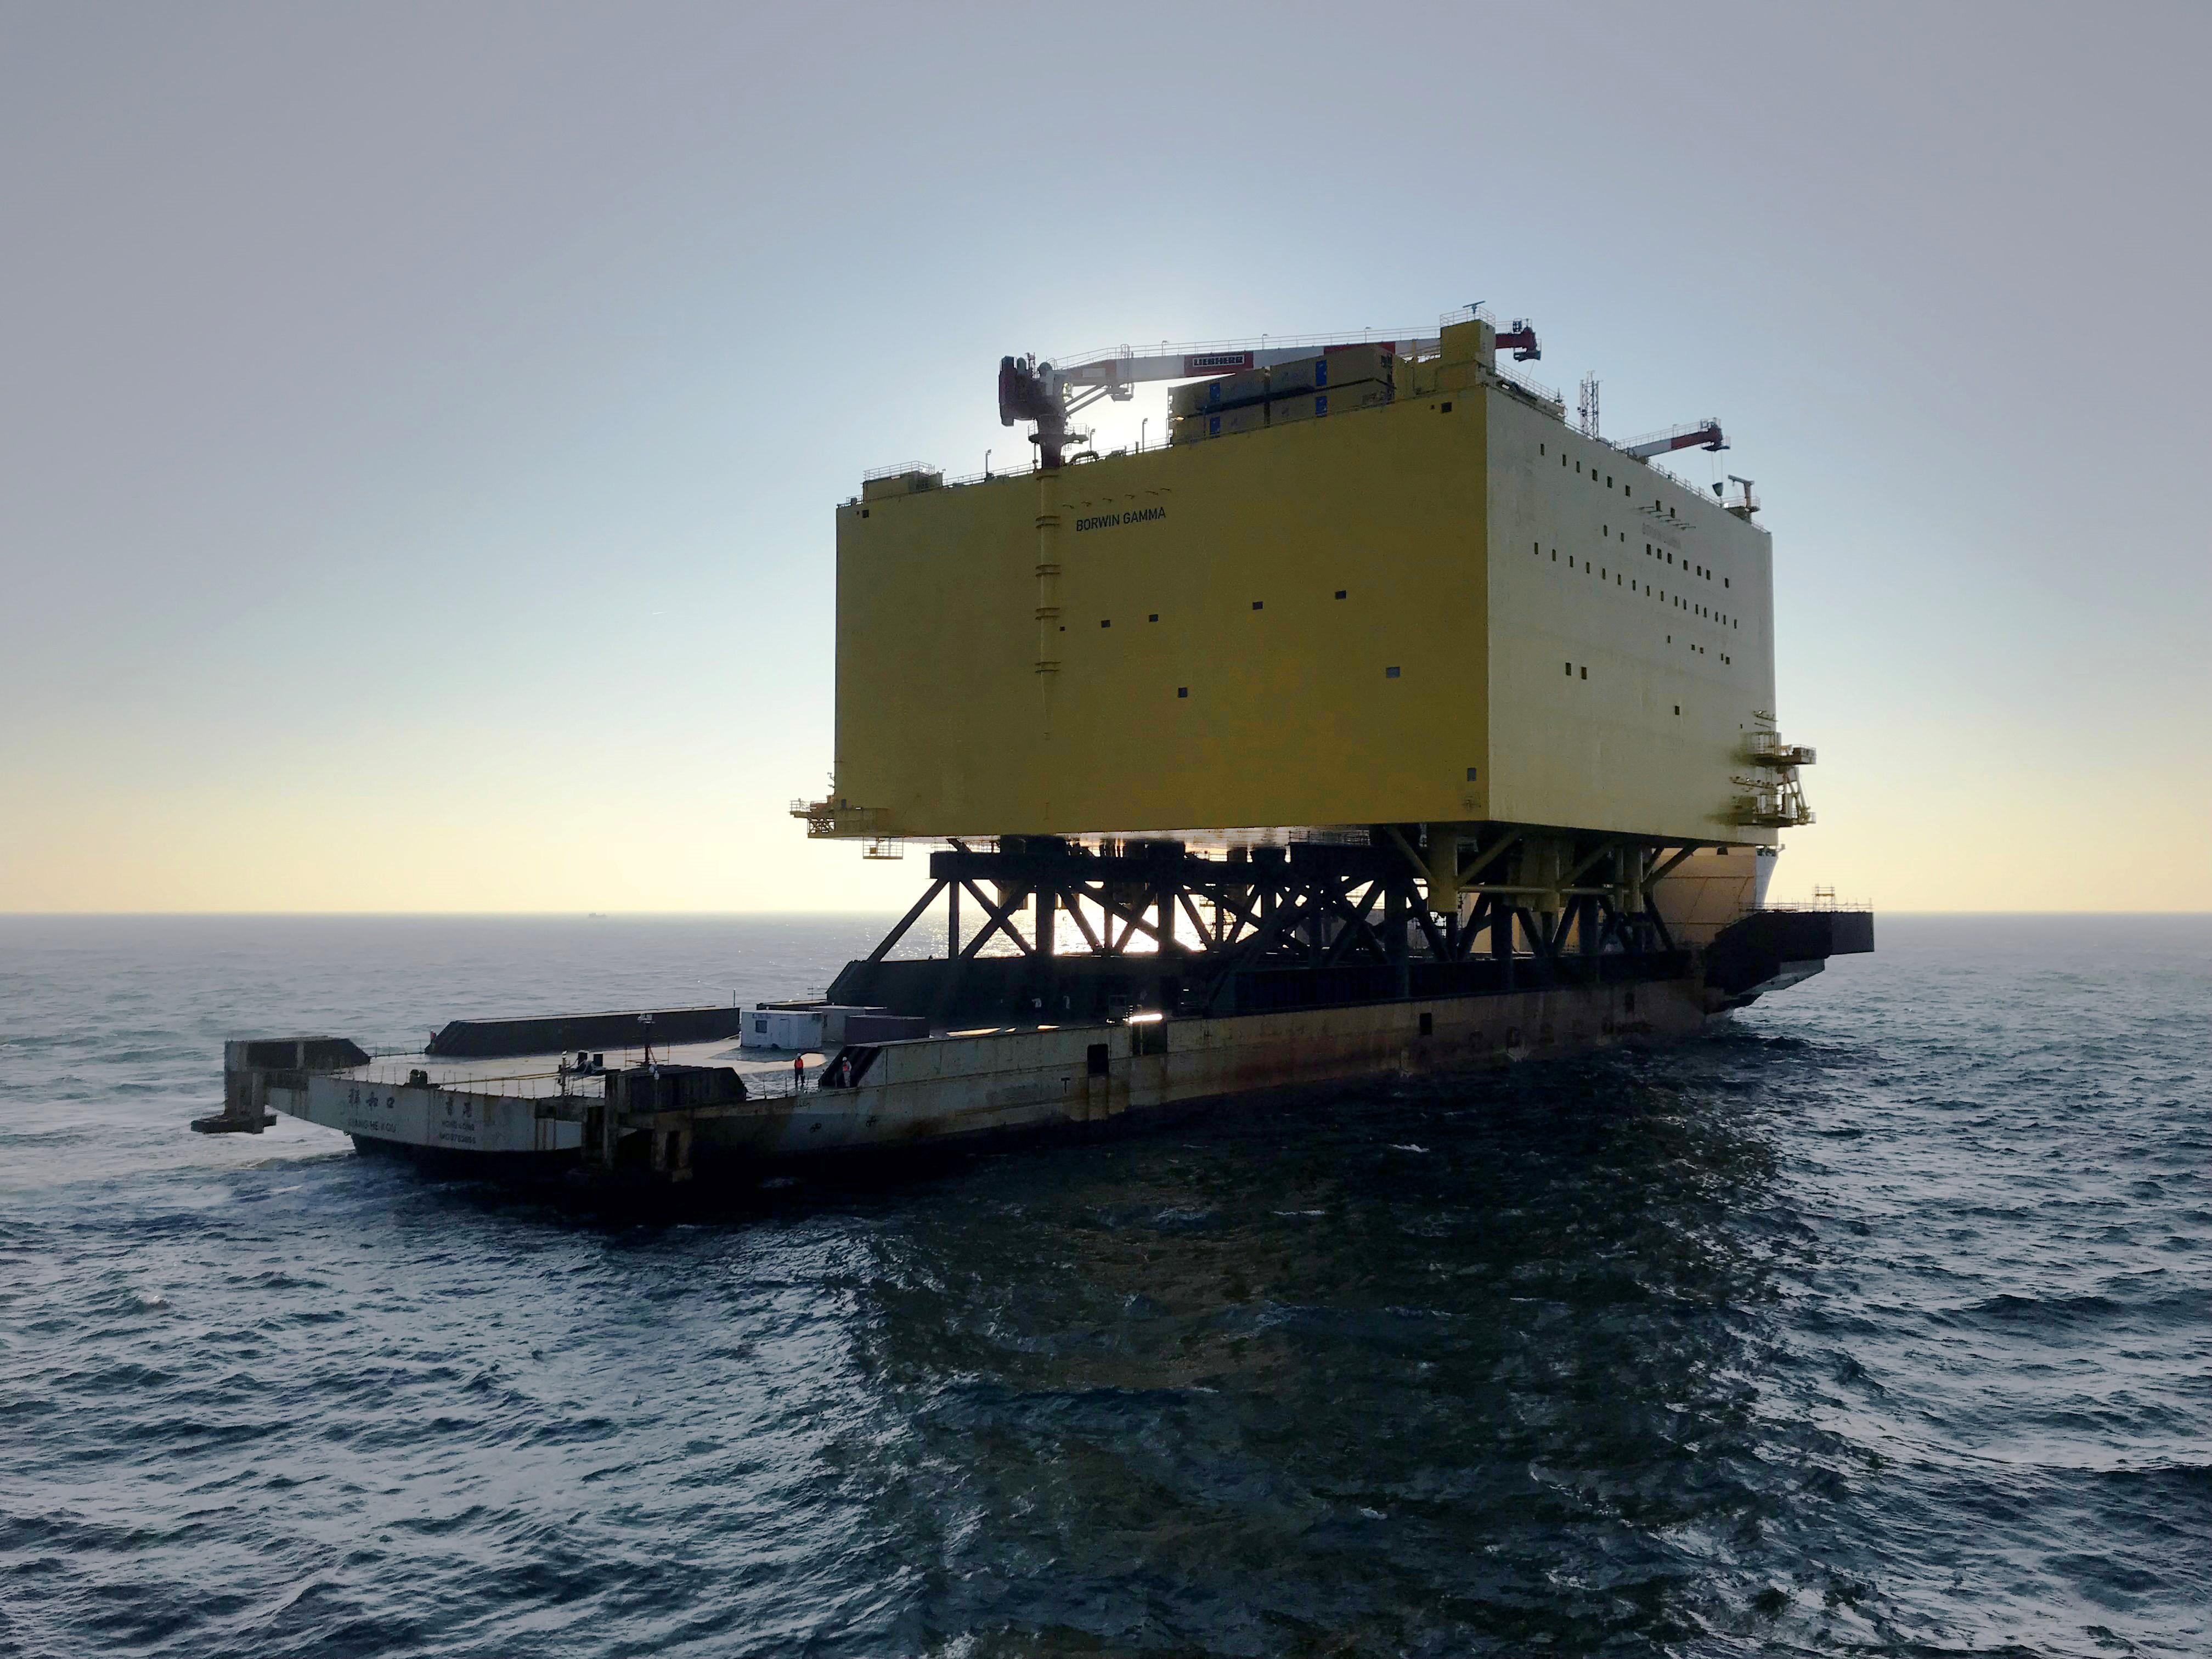 BorWin gamma topside being transported via heavy lift vessel